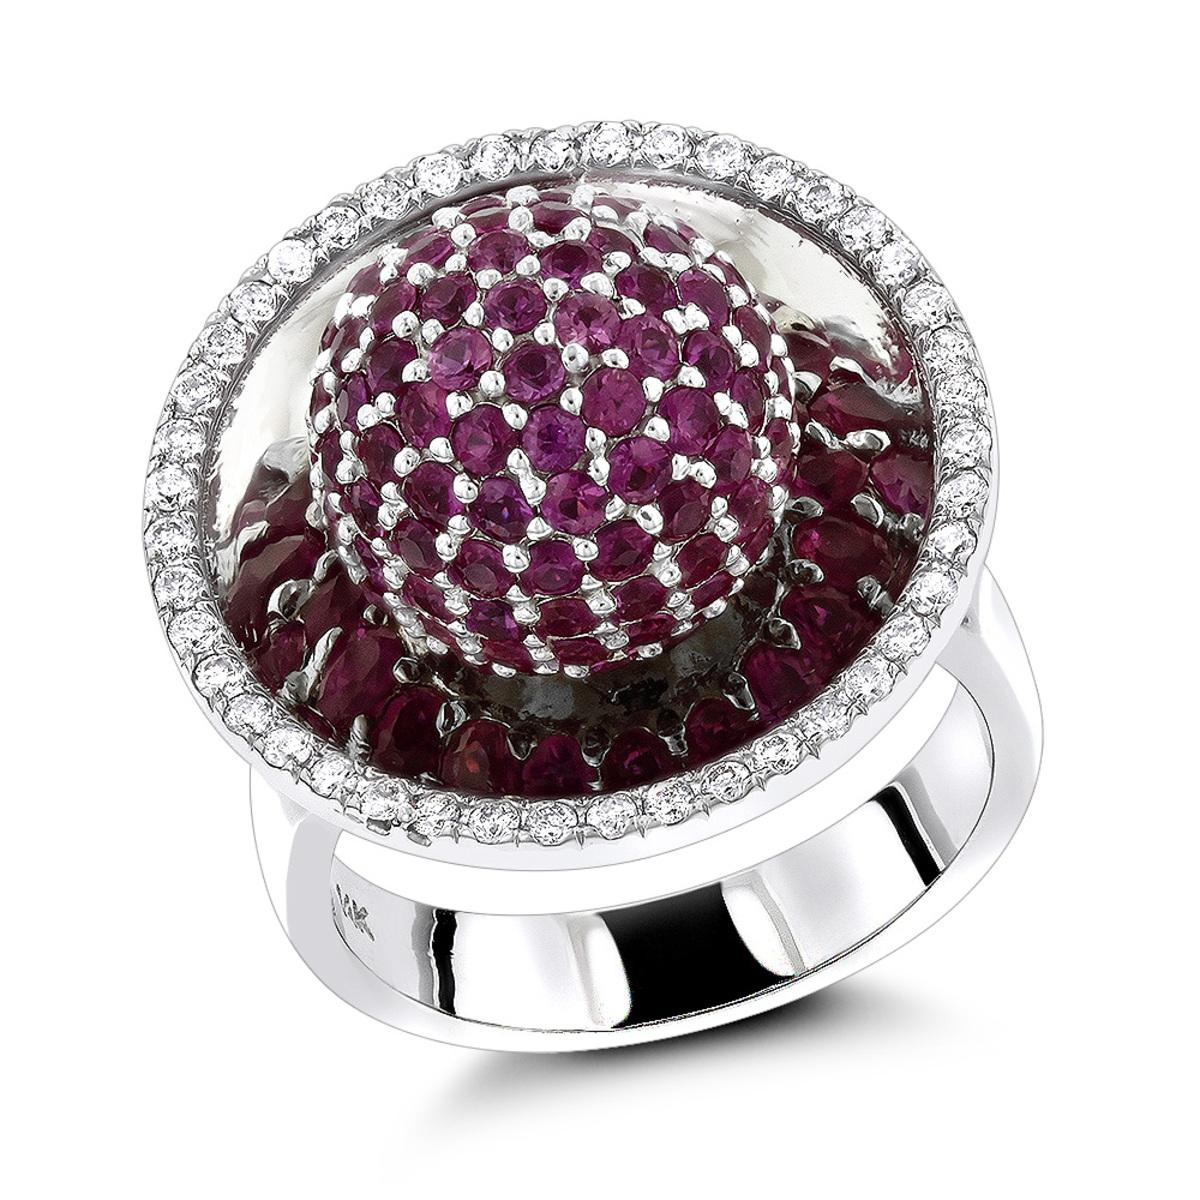 Diamond Fashion Rings Pink Sapphire Cocktail Ring 3.25